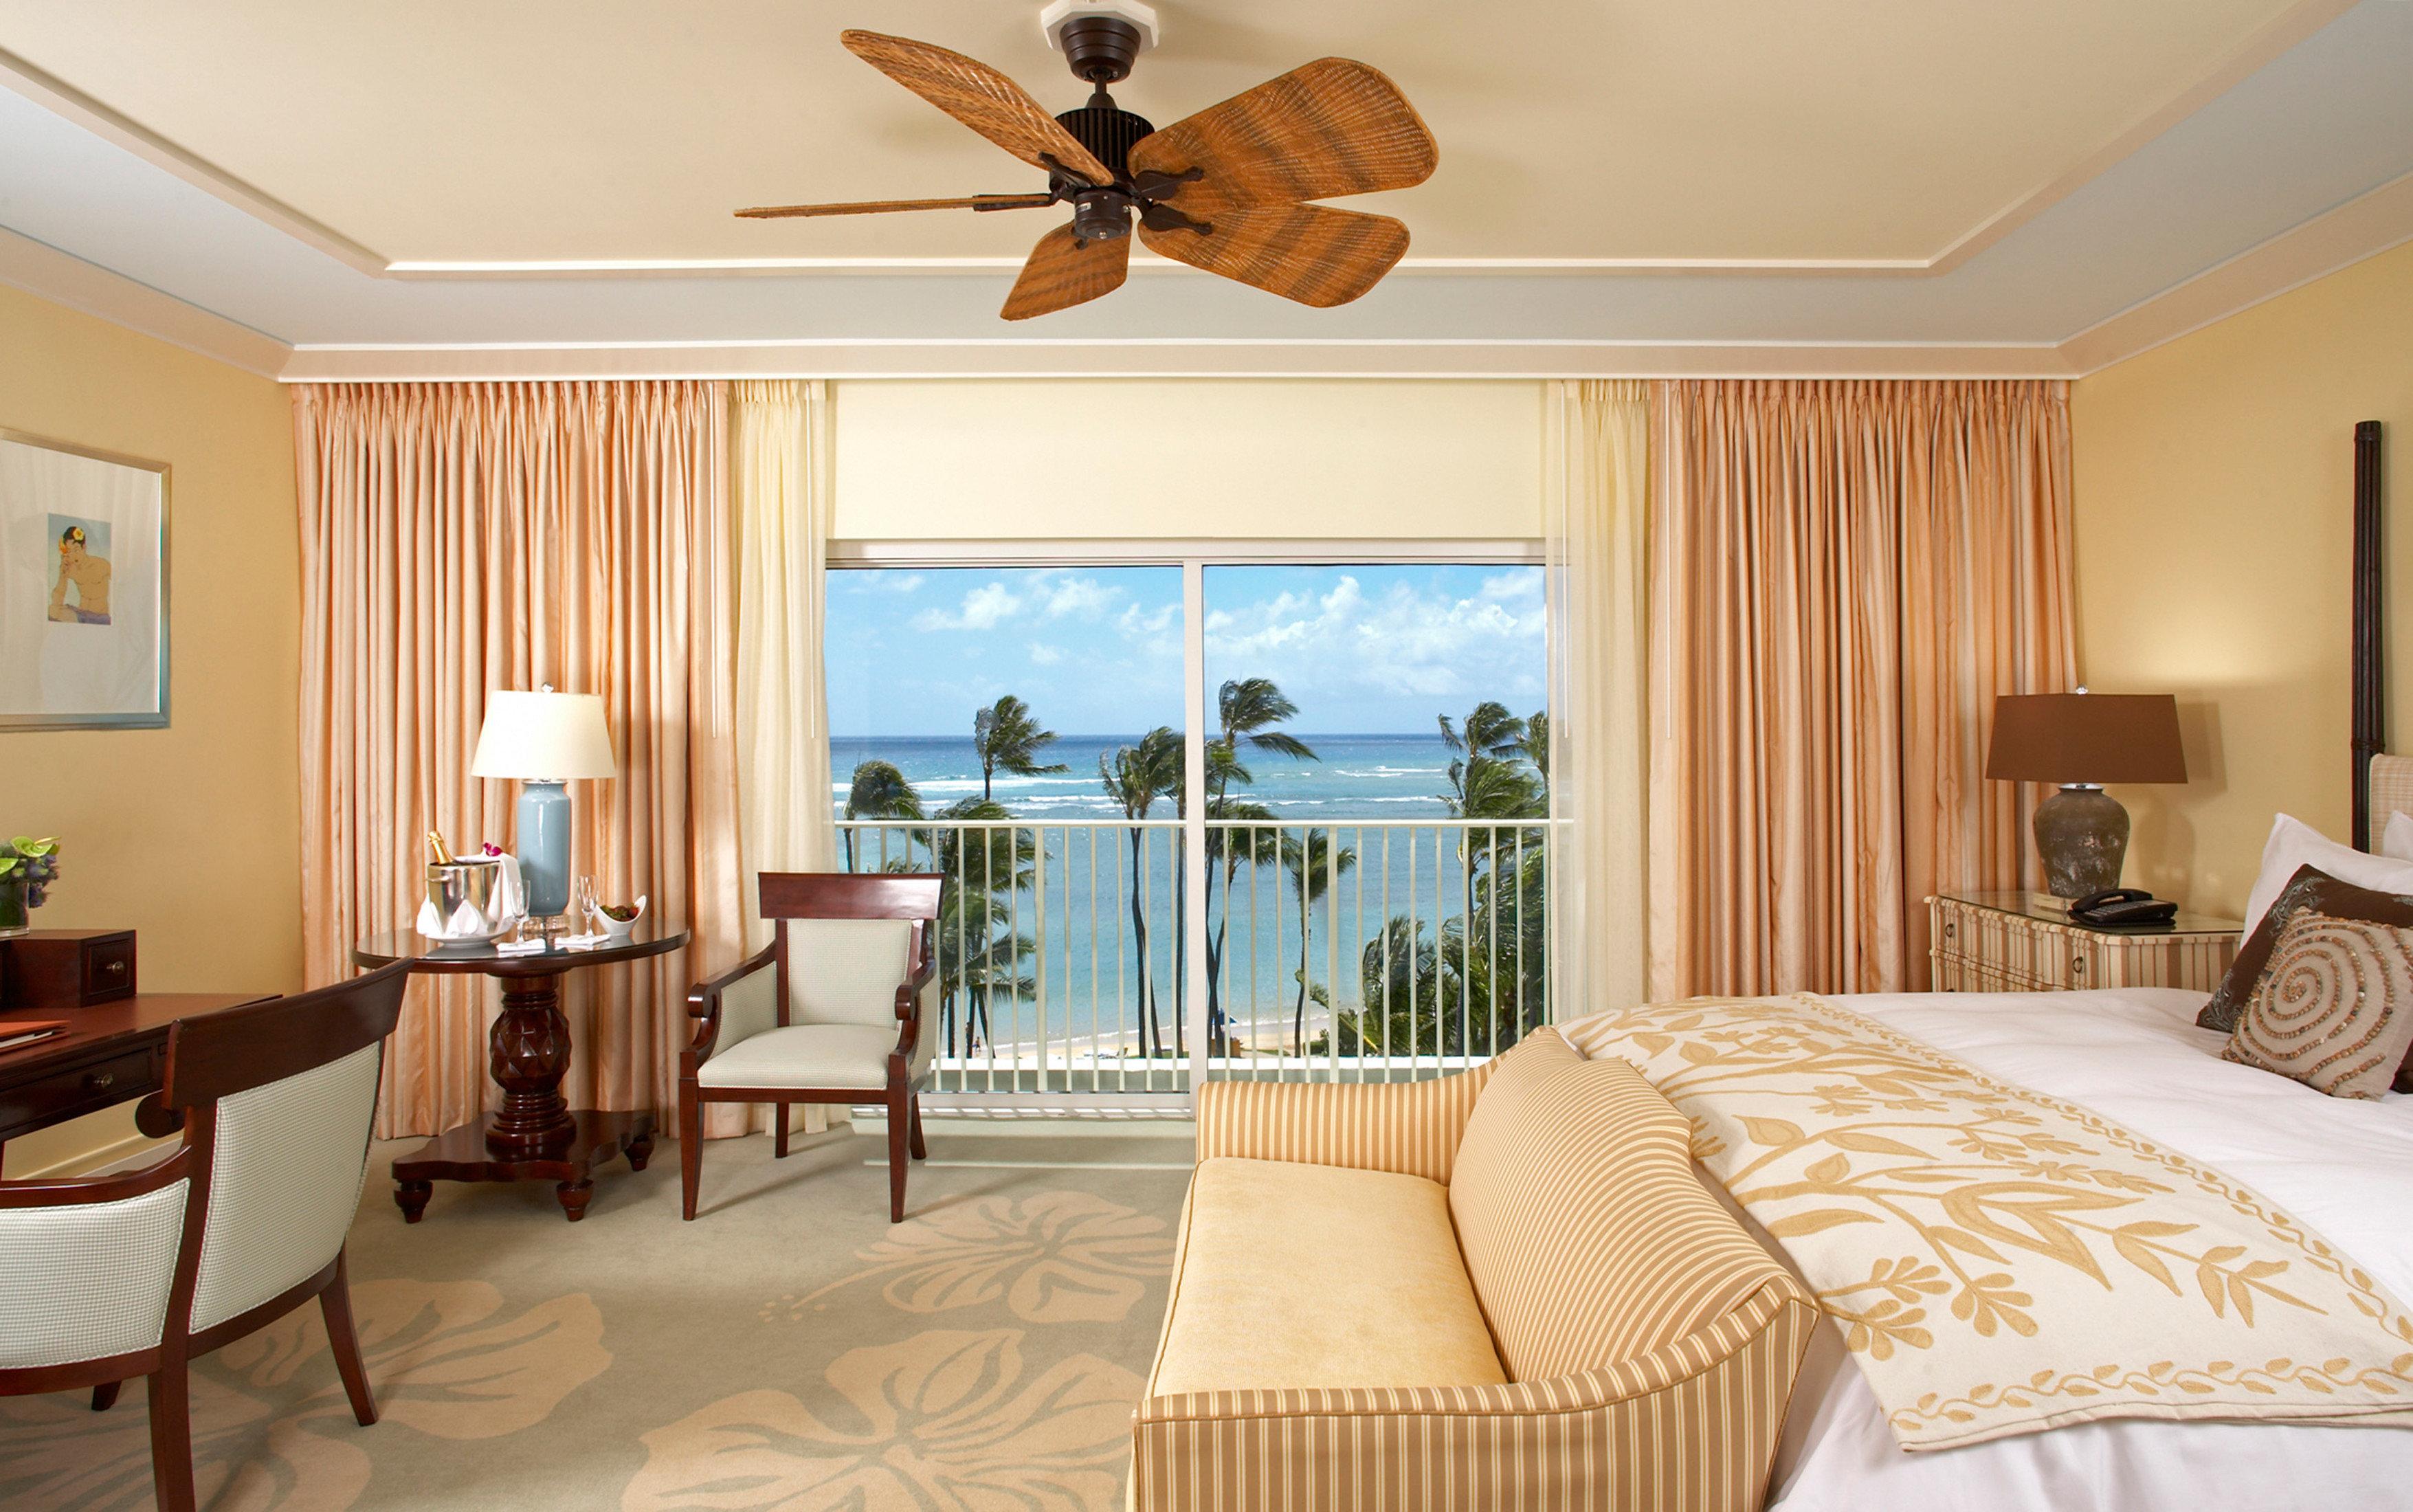 Balcony Beach Beachfront Bedroom Family Island Resort Romantic Scenic views property Suite living room home cottage Villa condominium flat